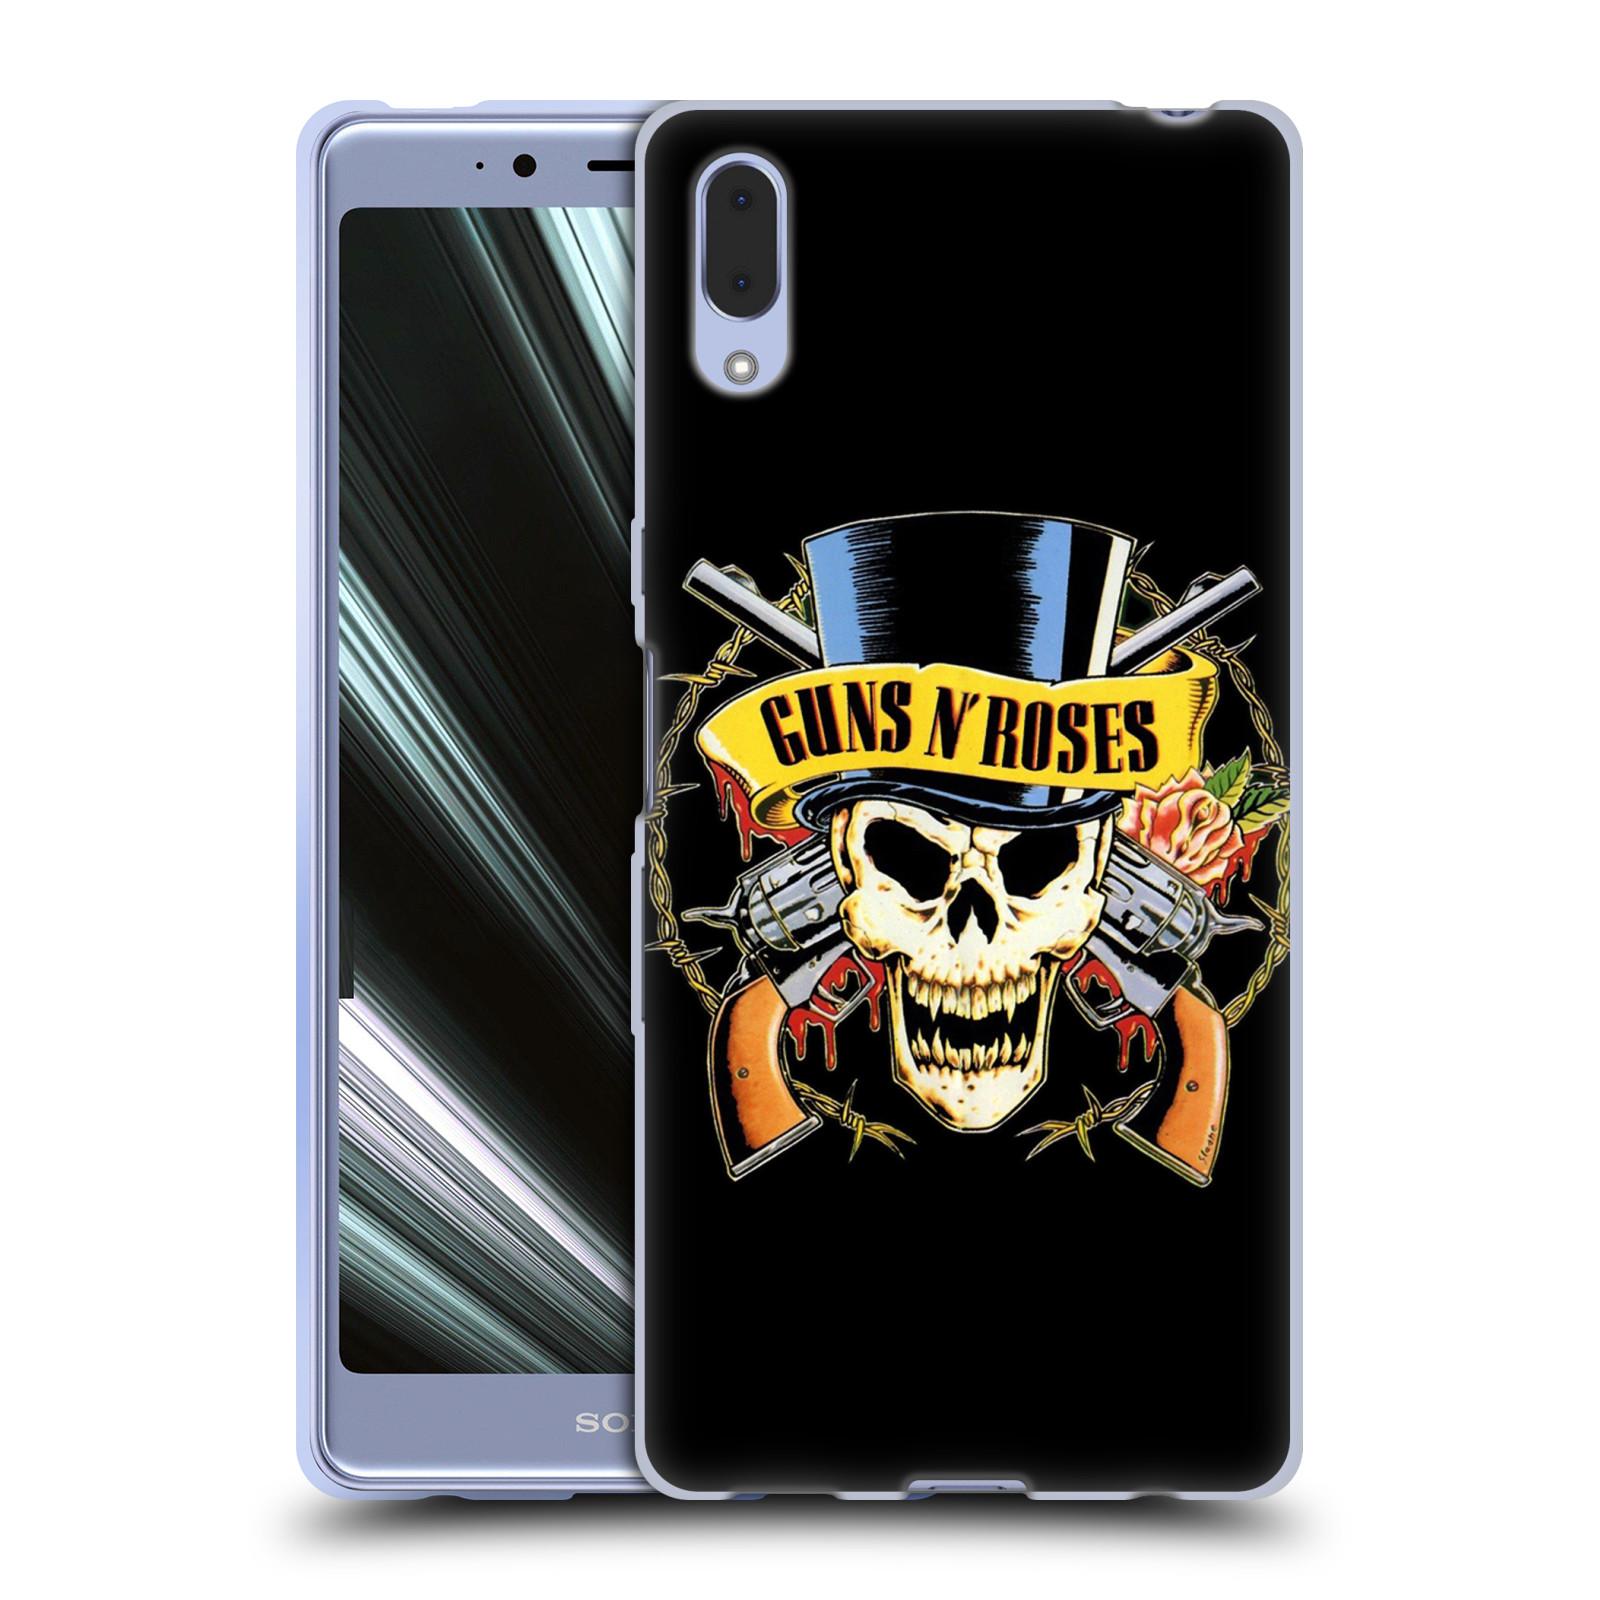 Silikonové pouzdro na mobil Sony Xperia L3 - Head Case - Guns N' Roses - Lebka